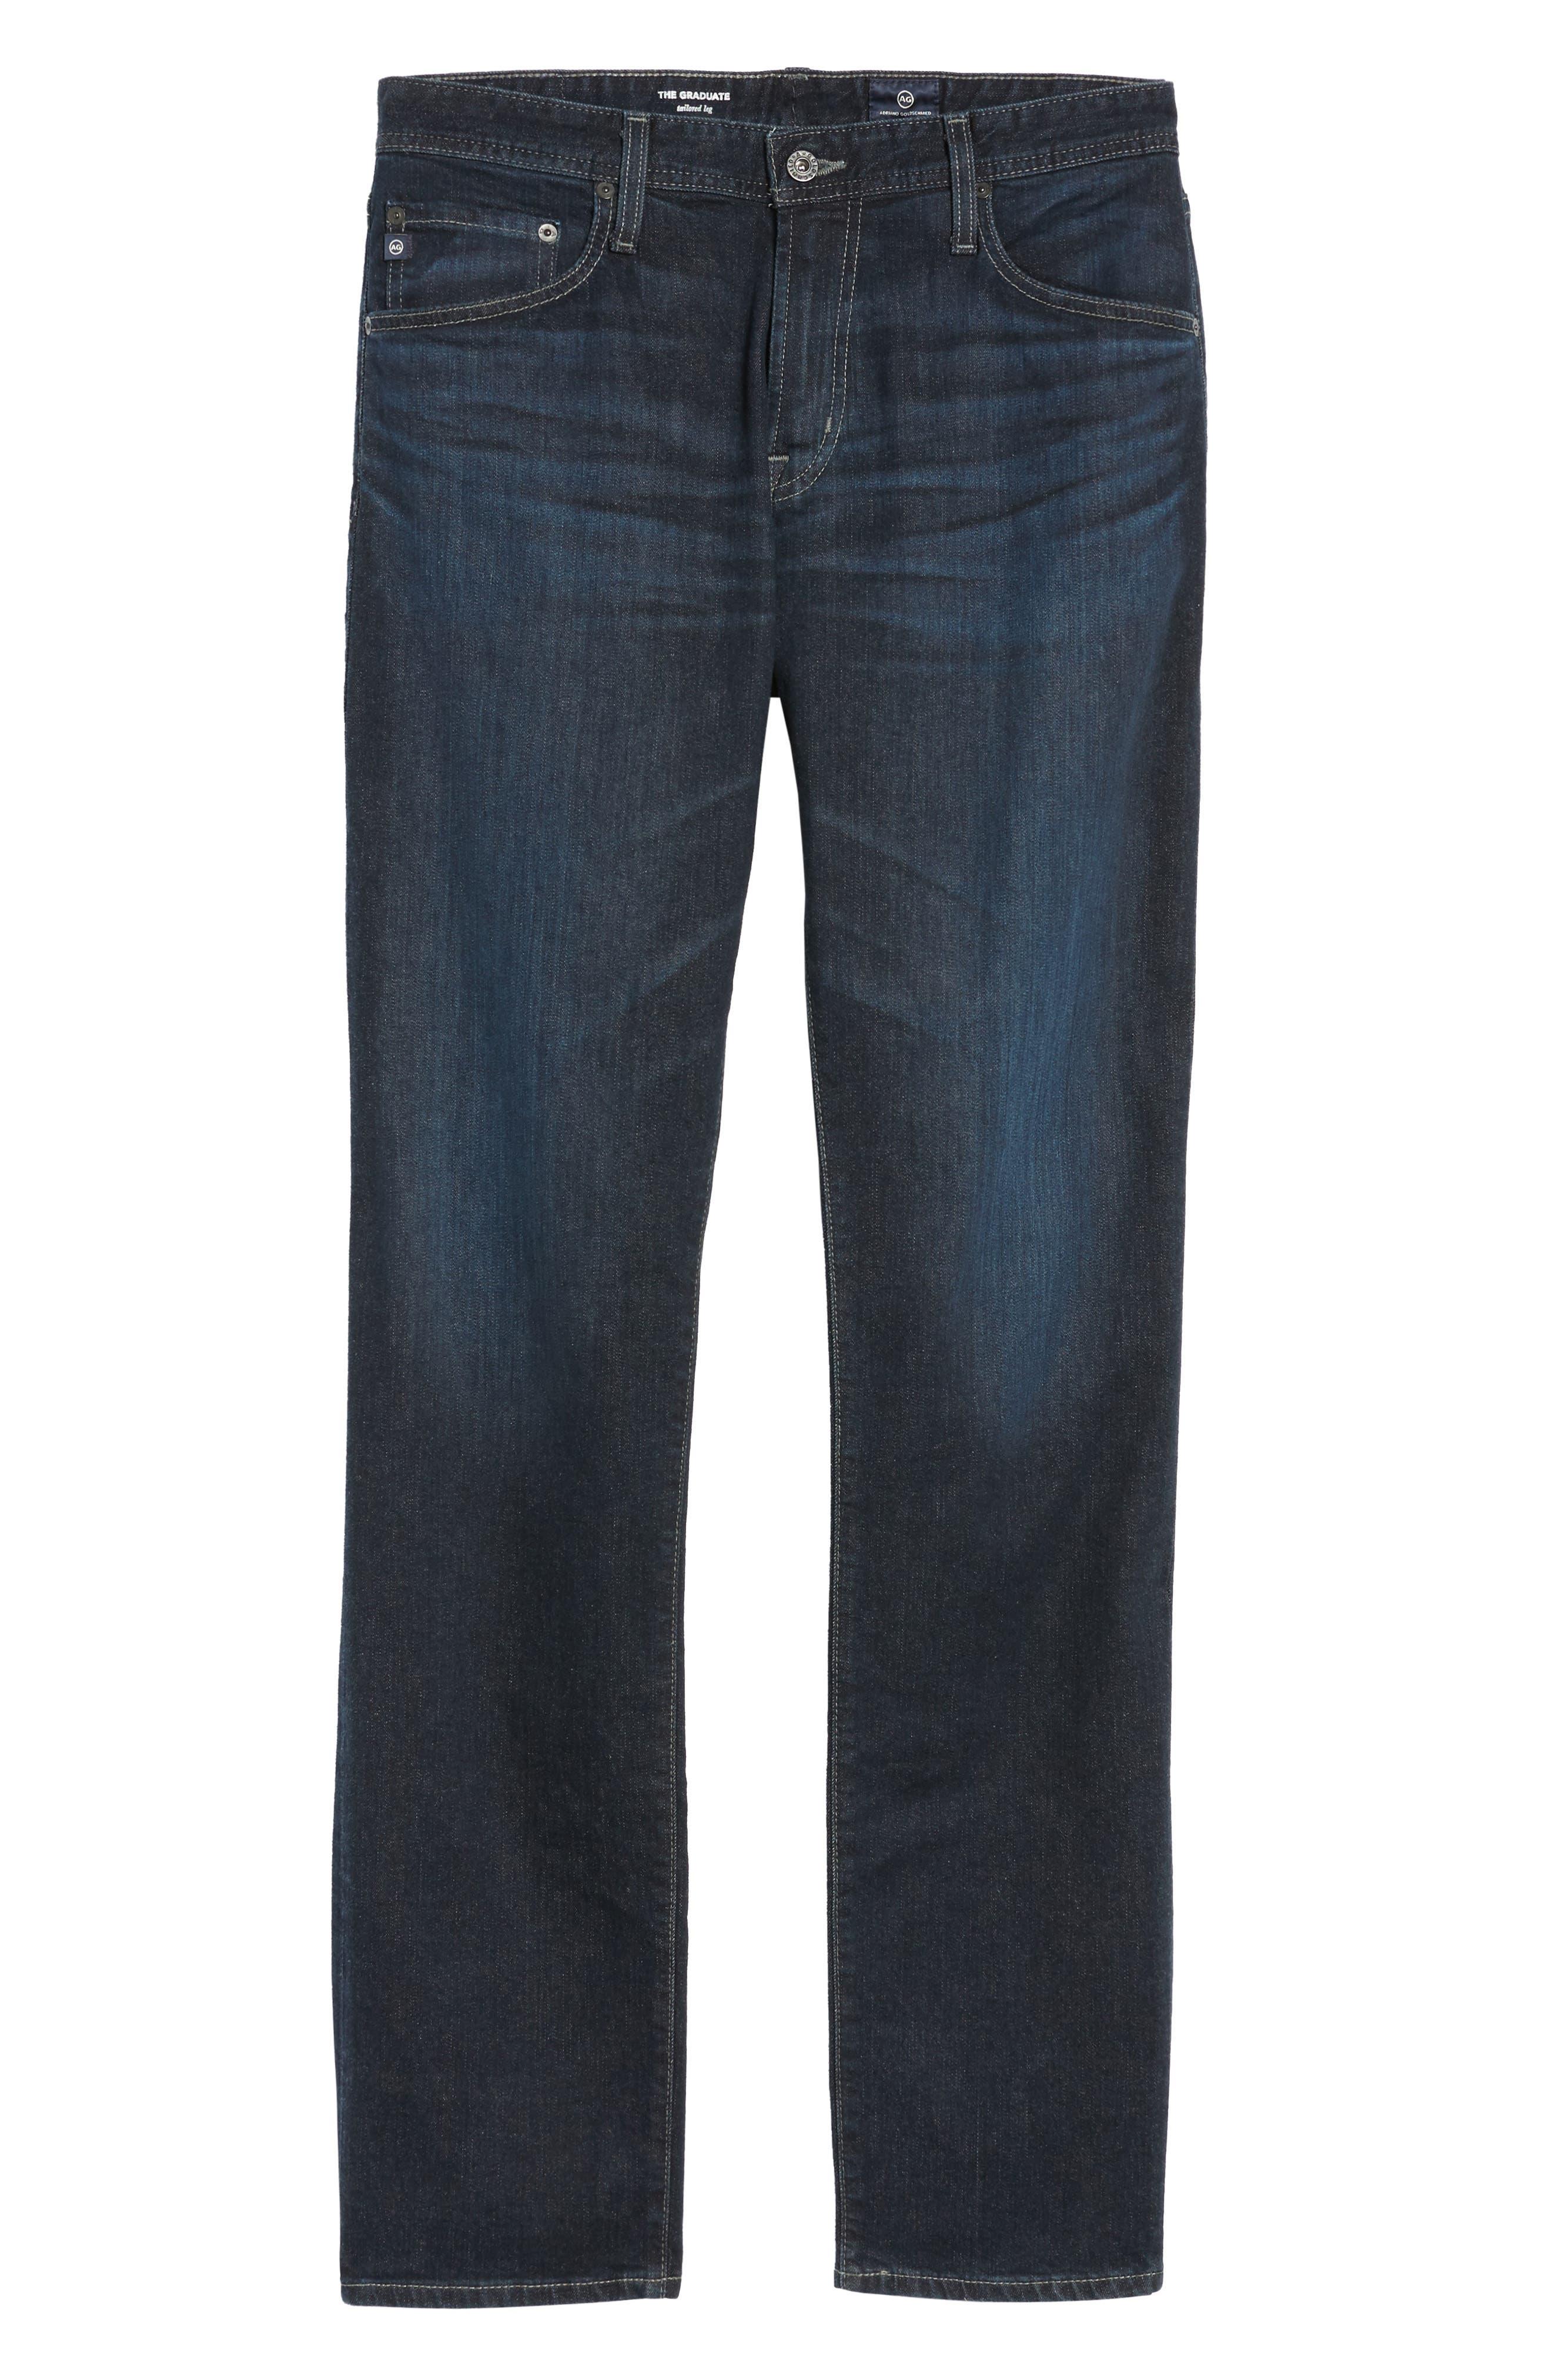 Graduate Slim Straight Leg Jeans,                             Main thumbnail 1, color,                             ROCKWELL